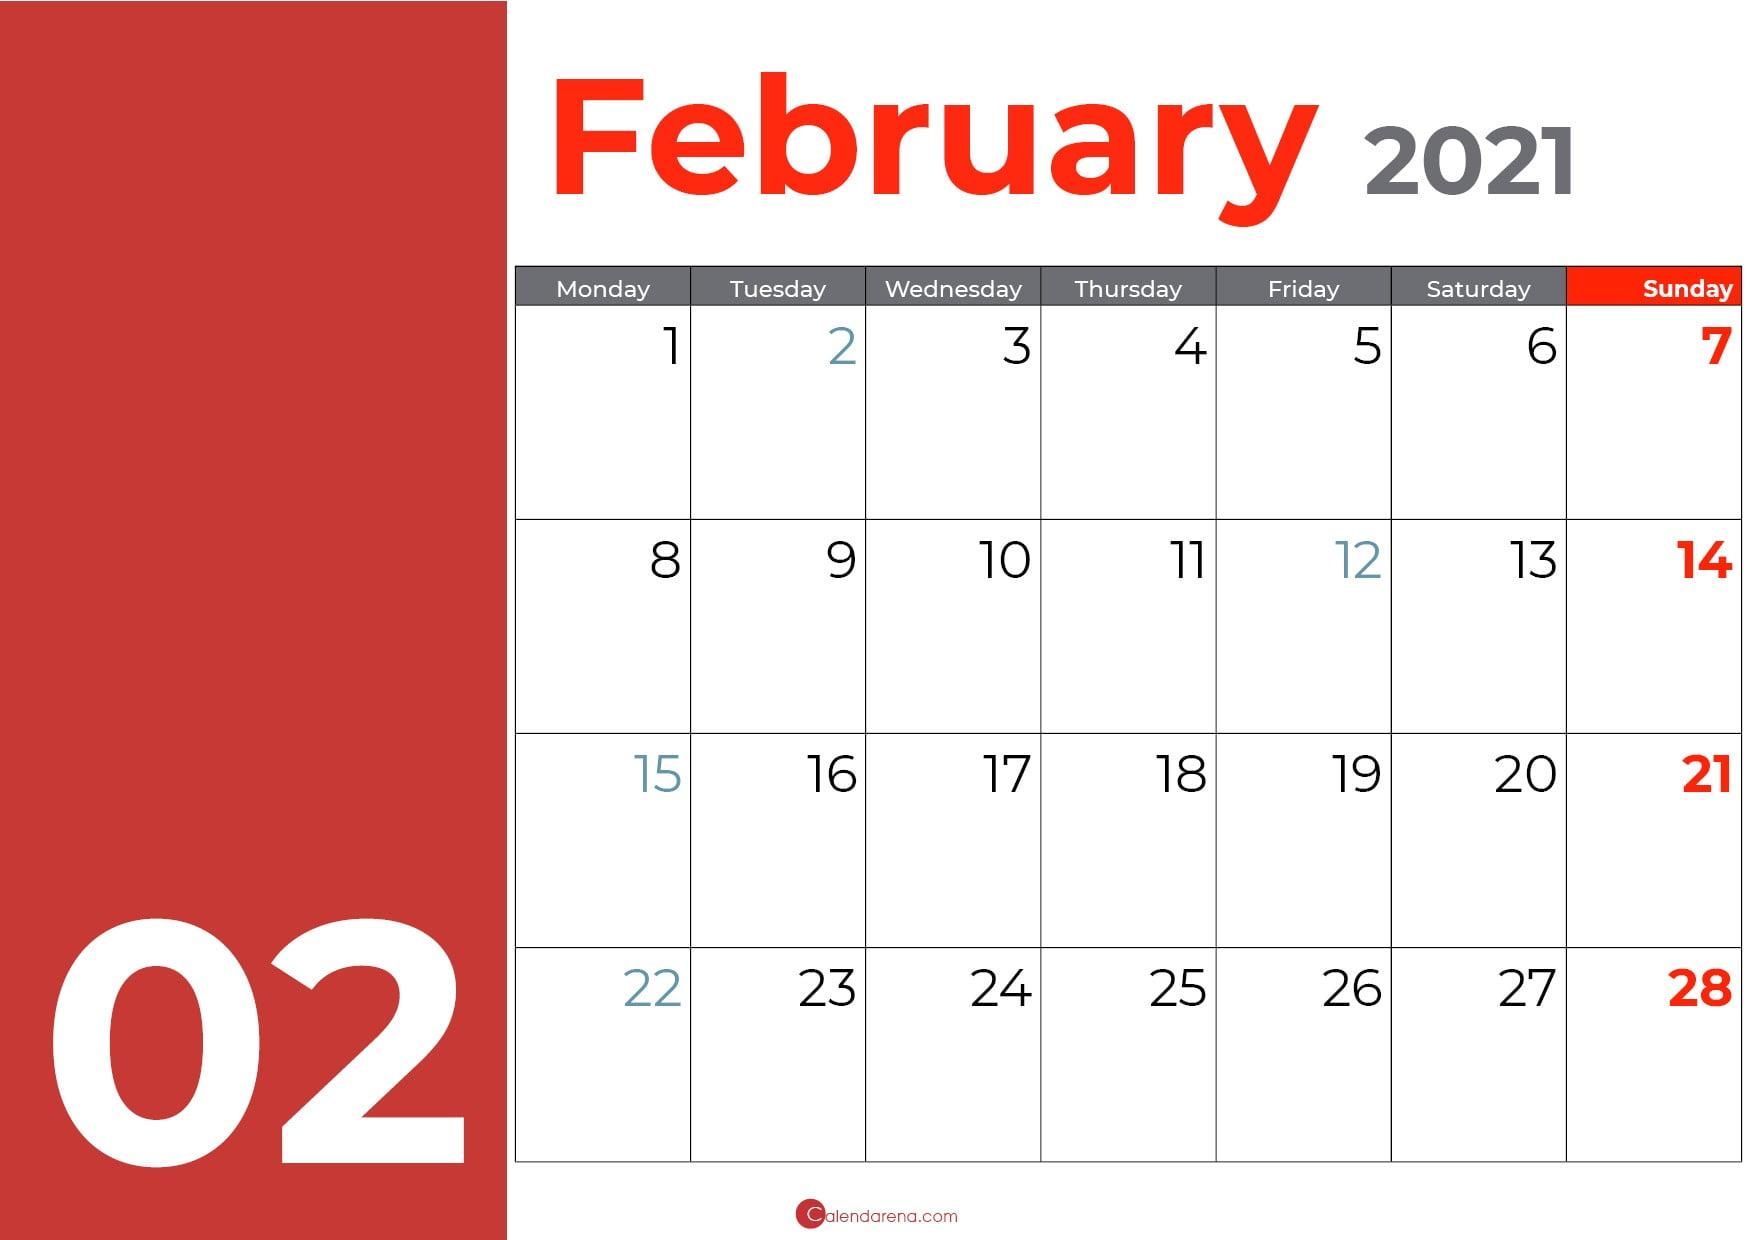 Best Free Blank February calendar 2021 - Calendarena